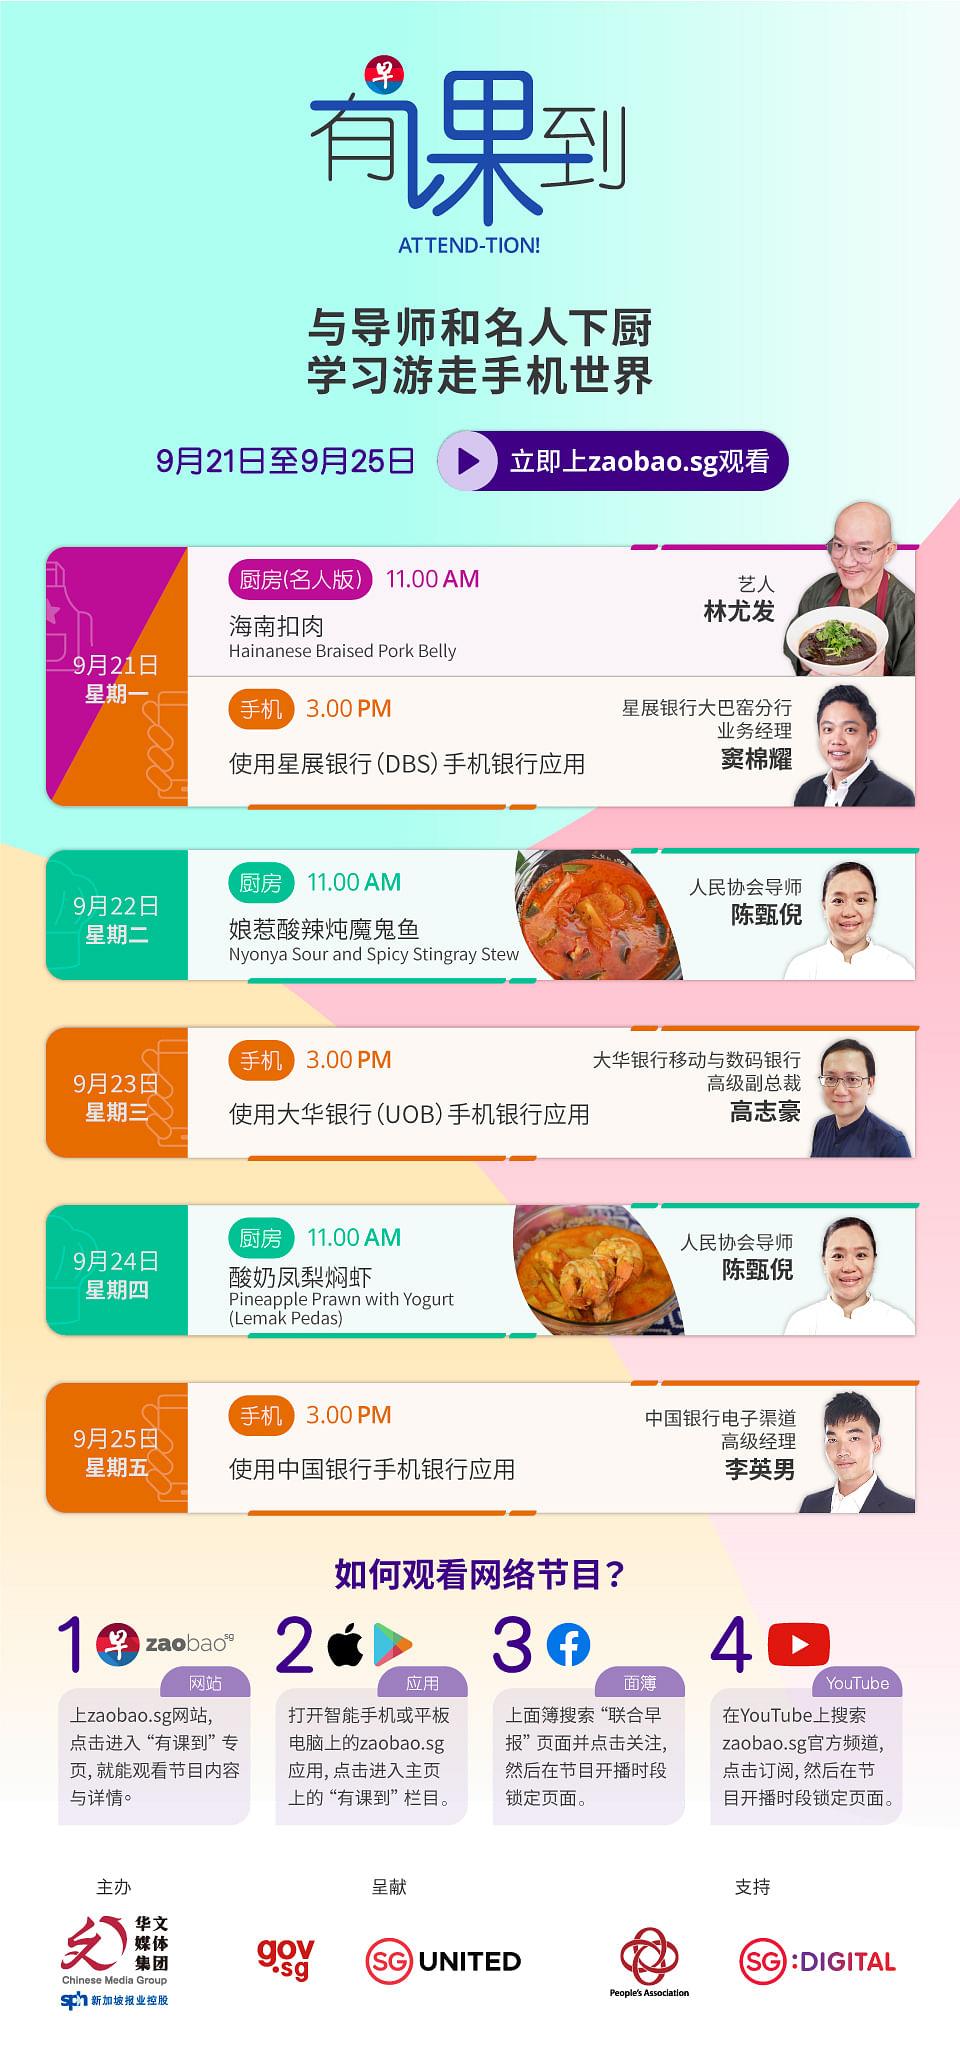 20200921_attendtion-program-schedule-week6.jpg